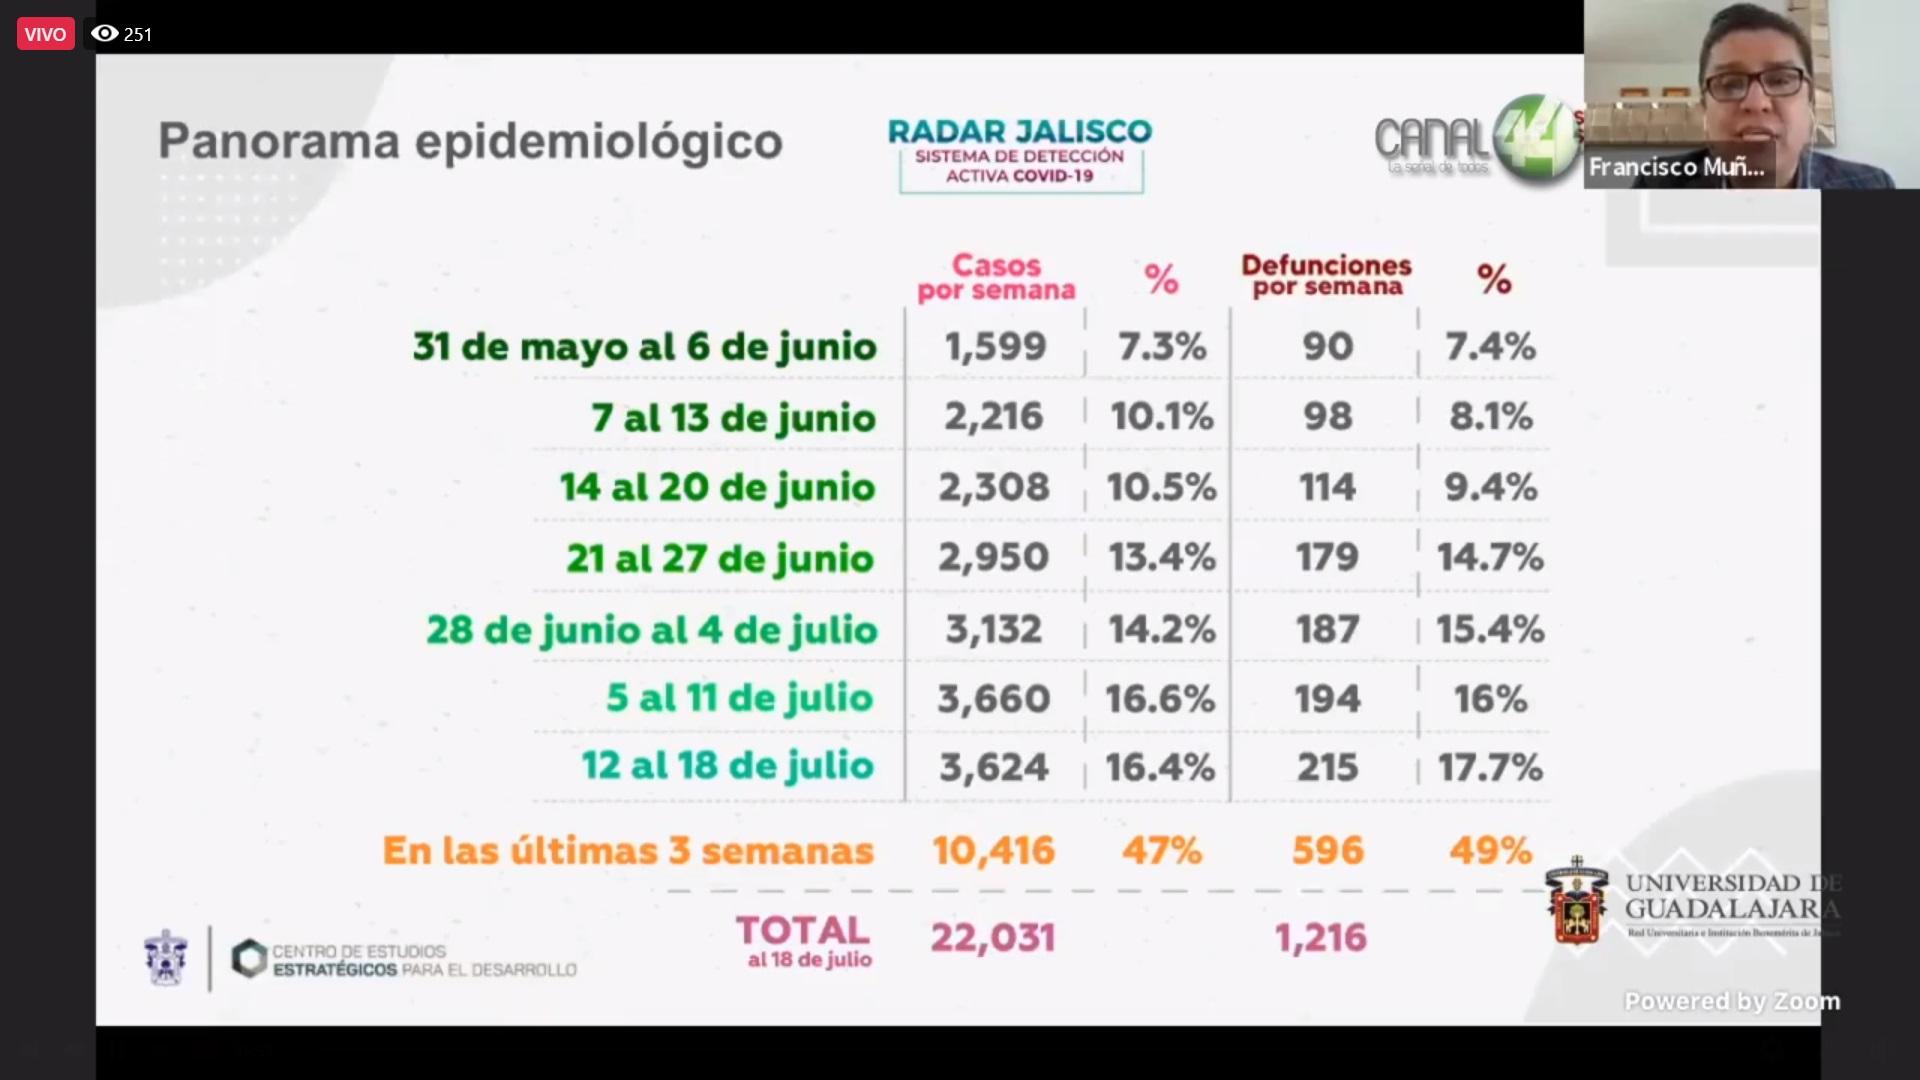 Diapositivas del  programa de préstamo de oxímetros para enfermos de  COVID-19